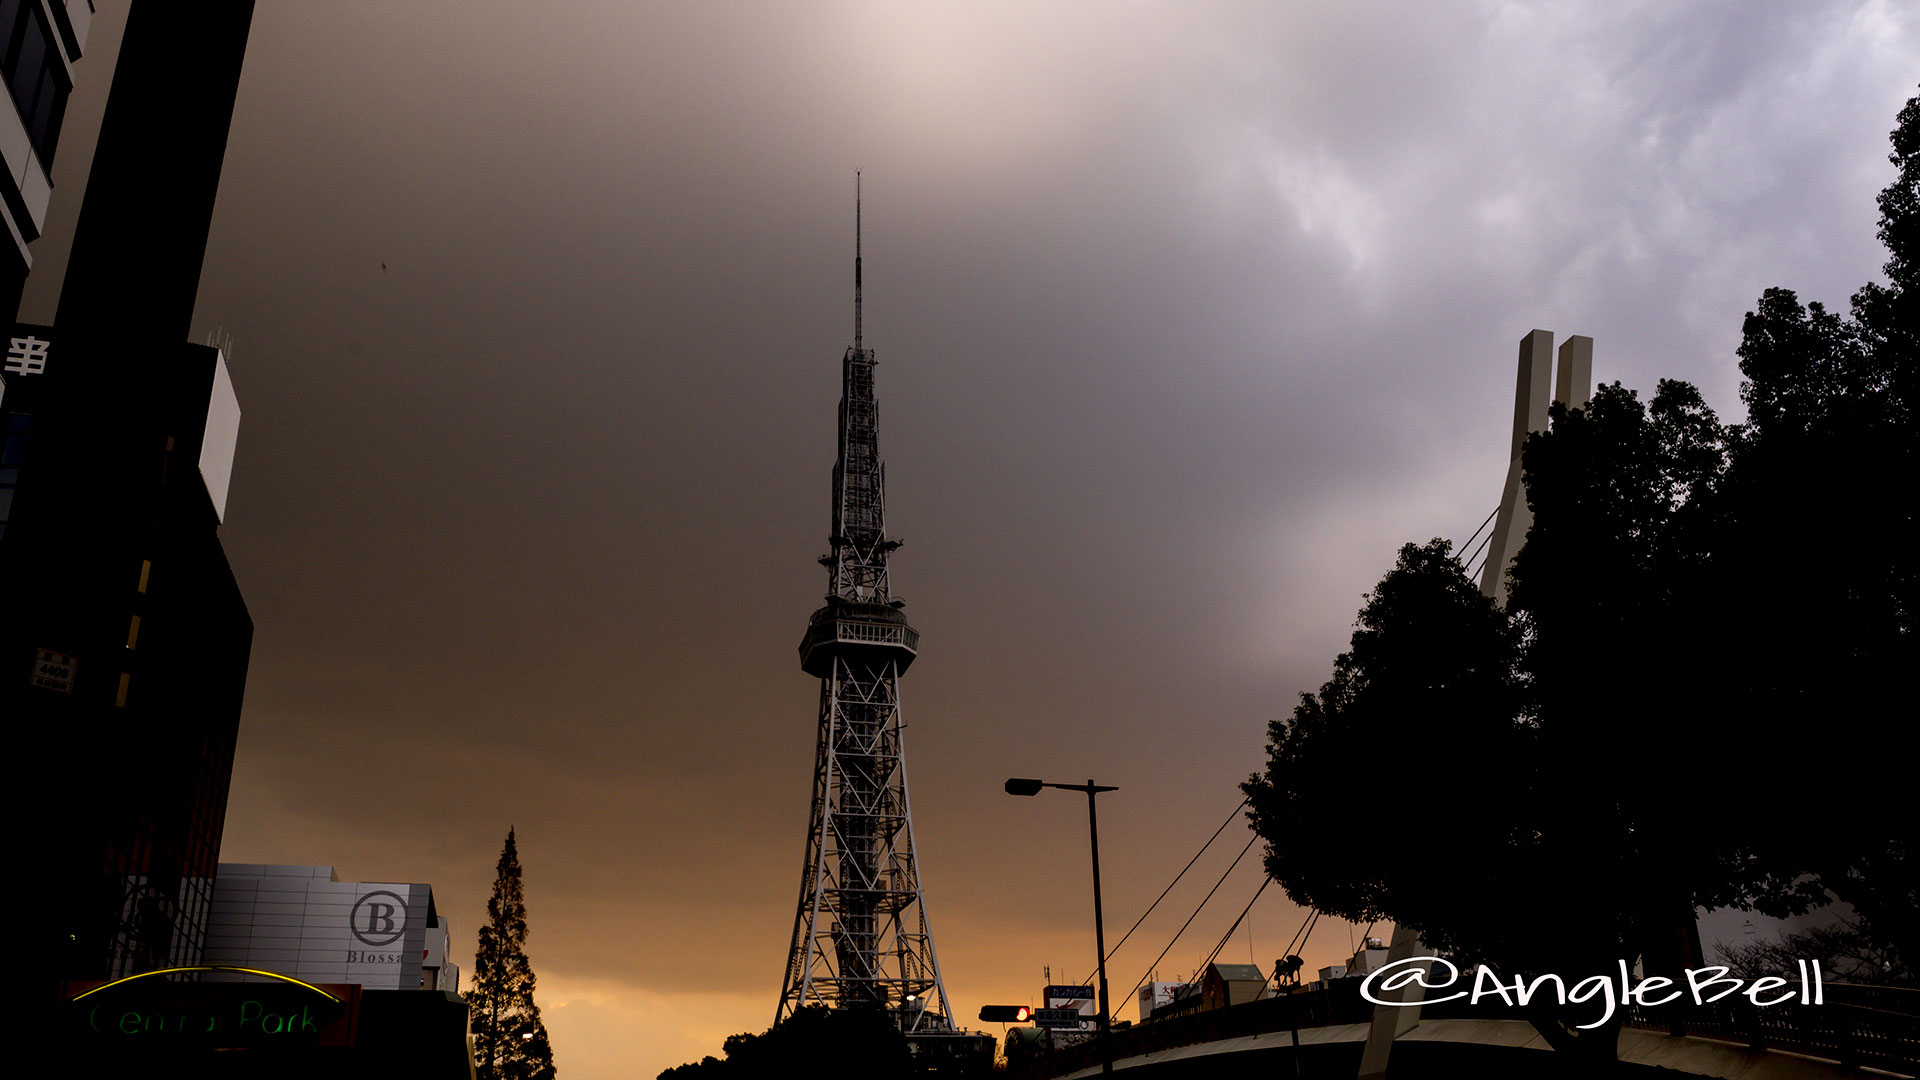 桜通久屋東 名古屋テレビ塔と夕日